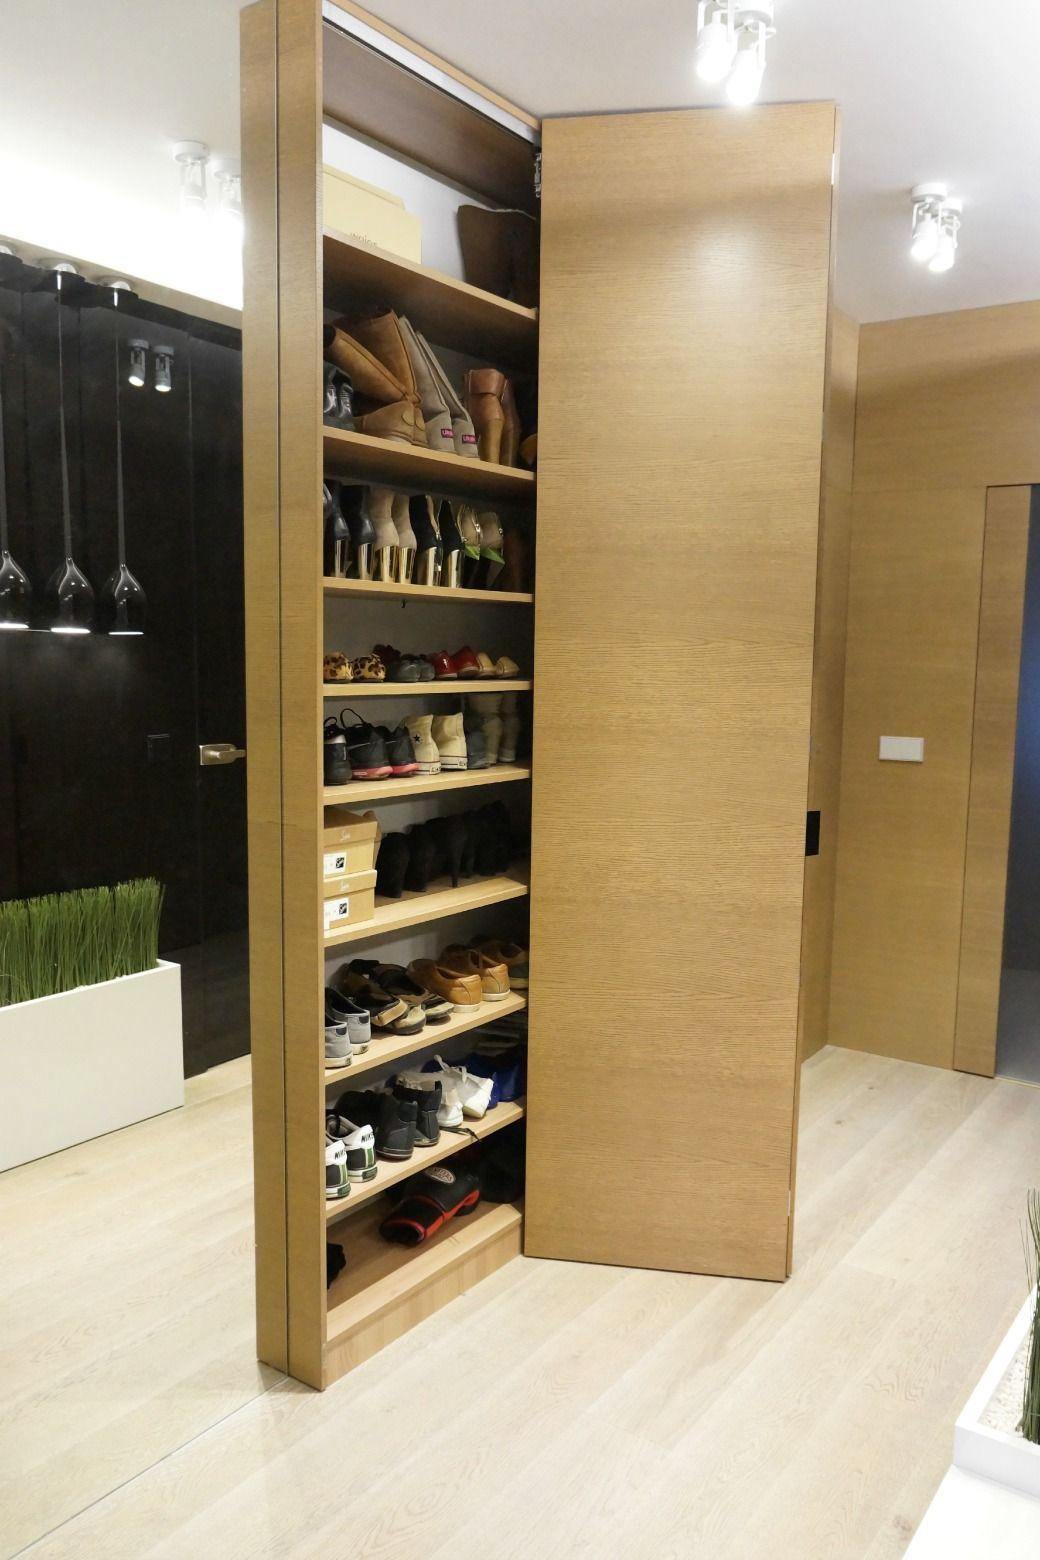 Korytarz W Naszym Mieszkaniu Built In Cupboards Sliding Door Design Interior Architecture